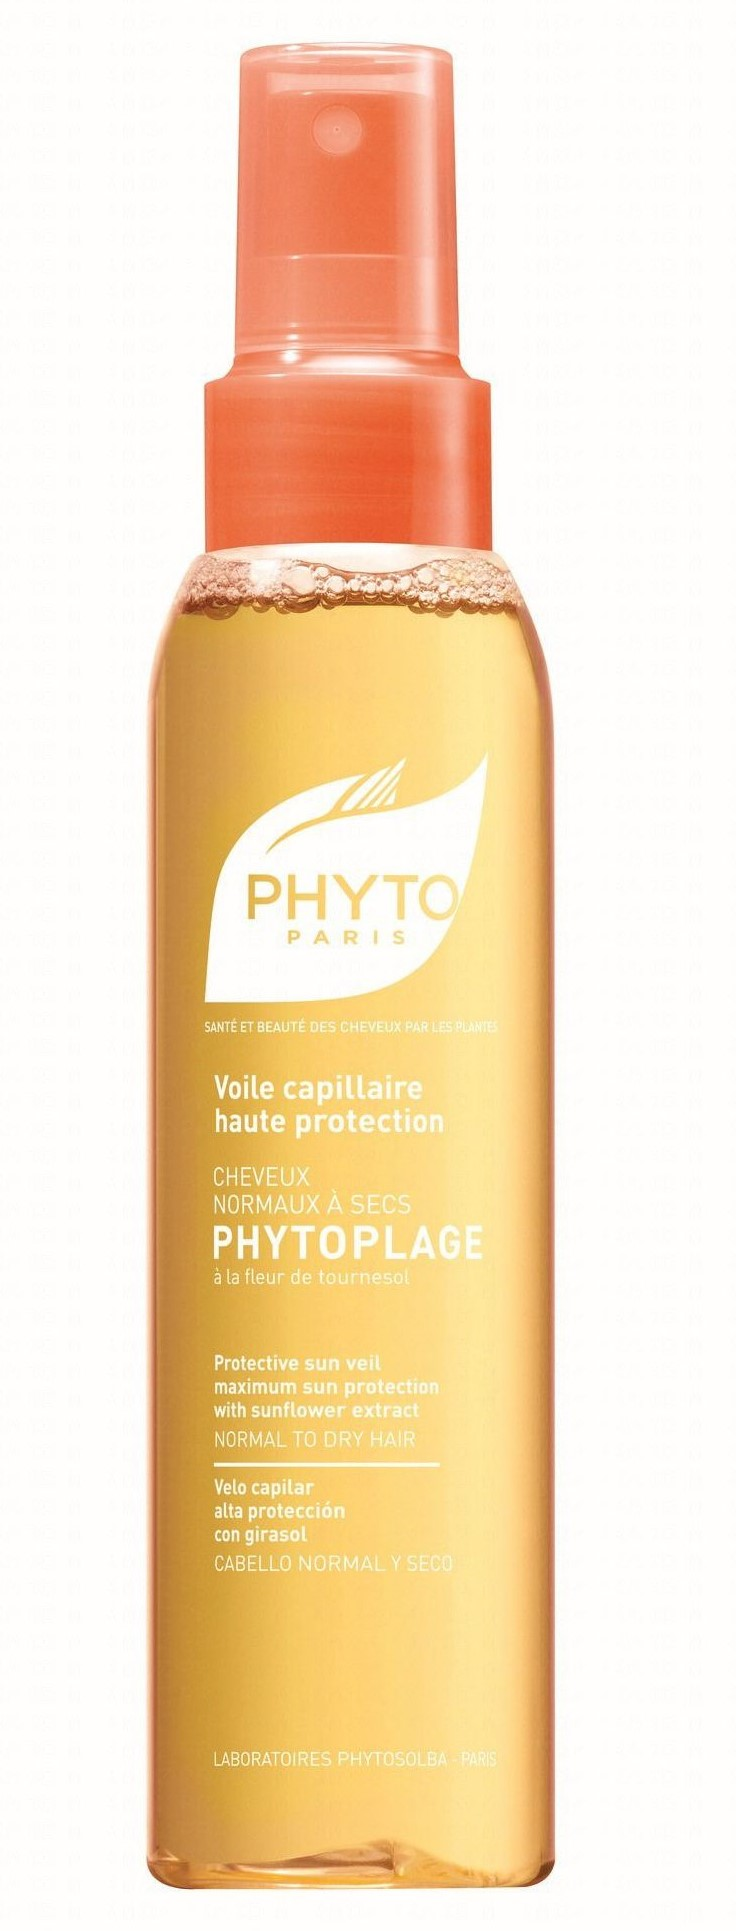 PHYTO-Plage-voile-protecteur-haute-protection-14872_2_1449579771